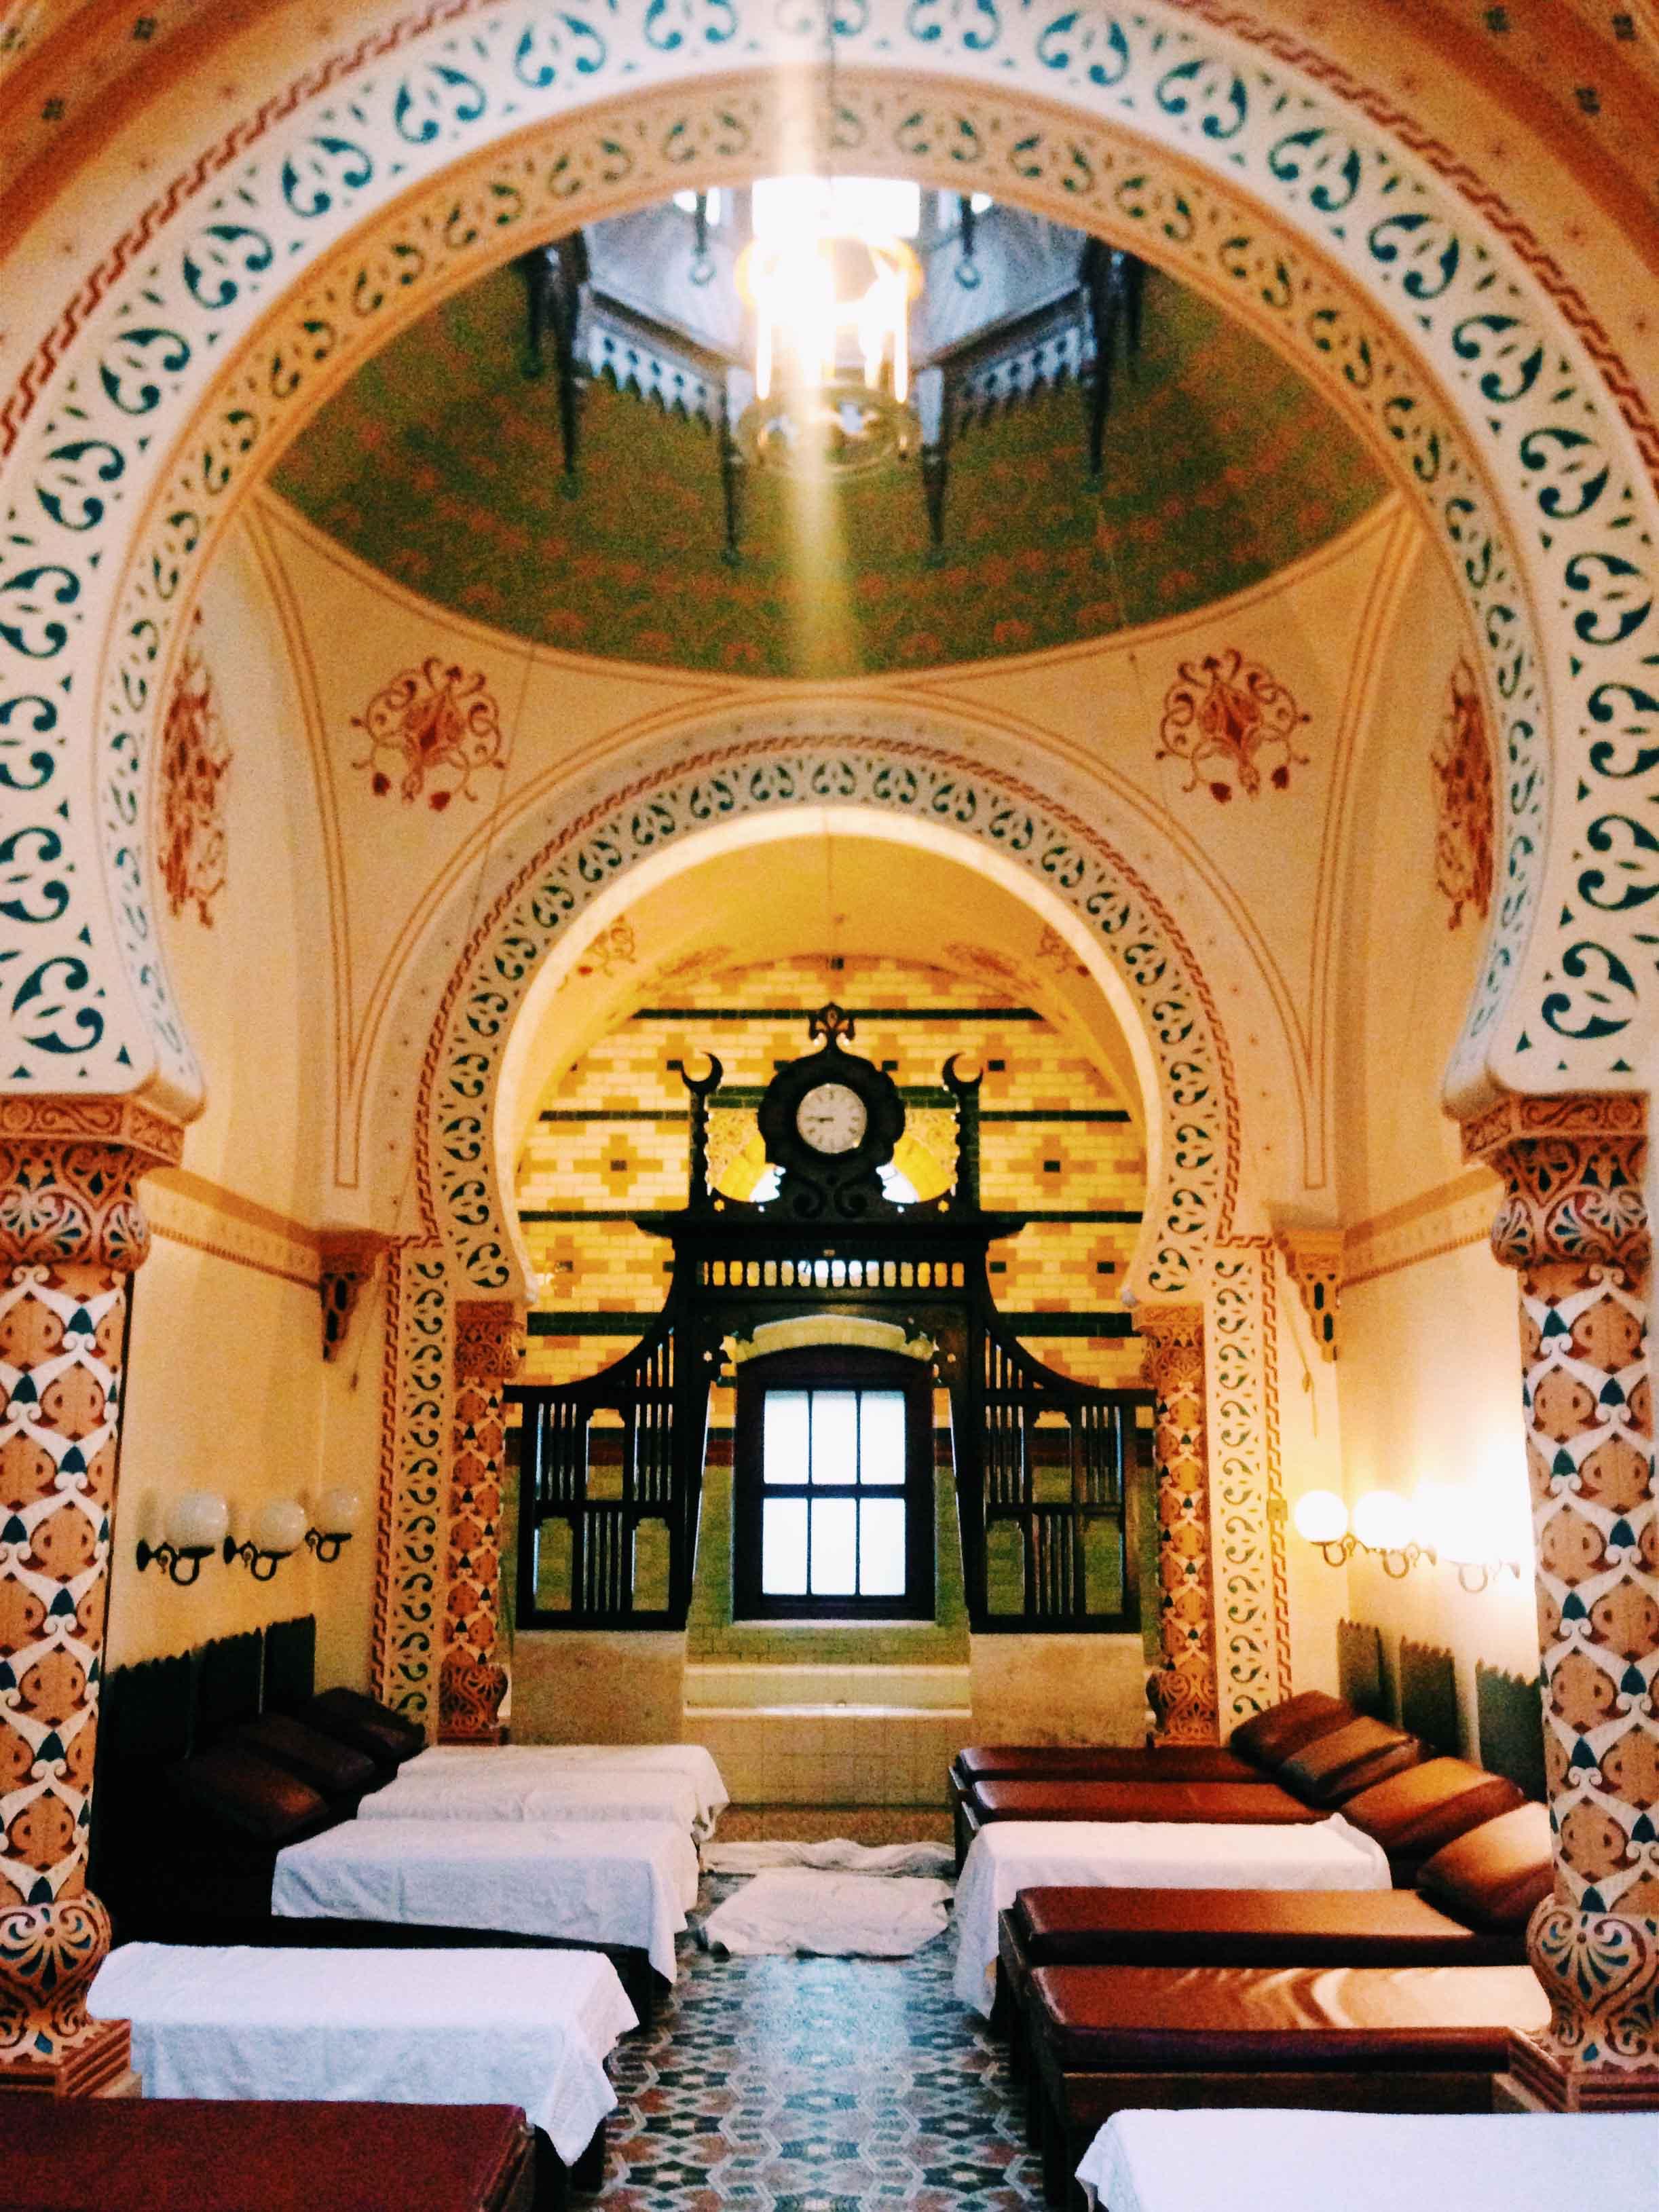 The ornate Turkish Baths in Harrogate, North Yorkshire, England.